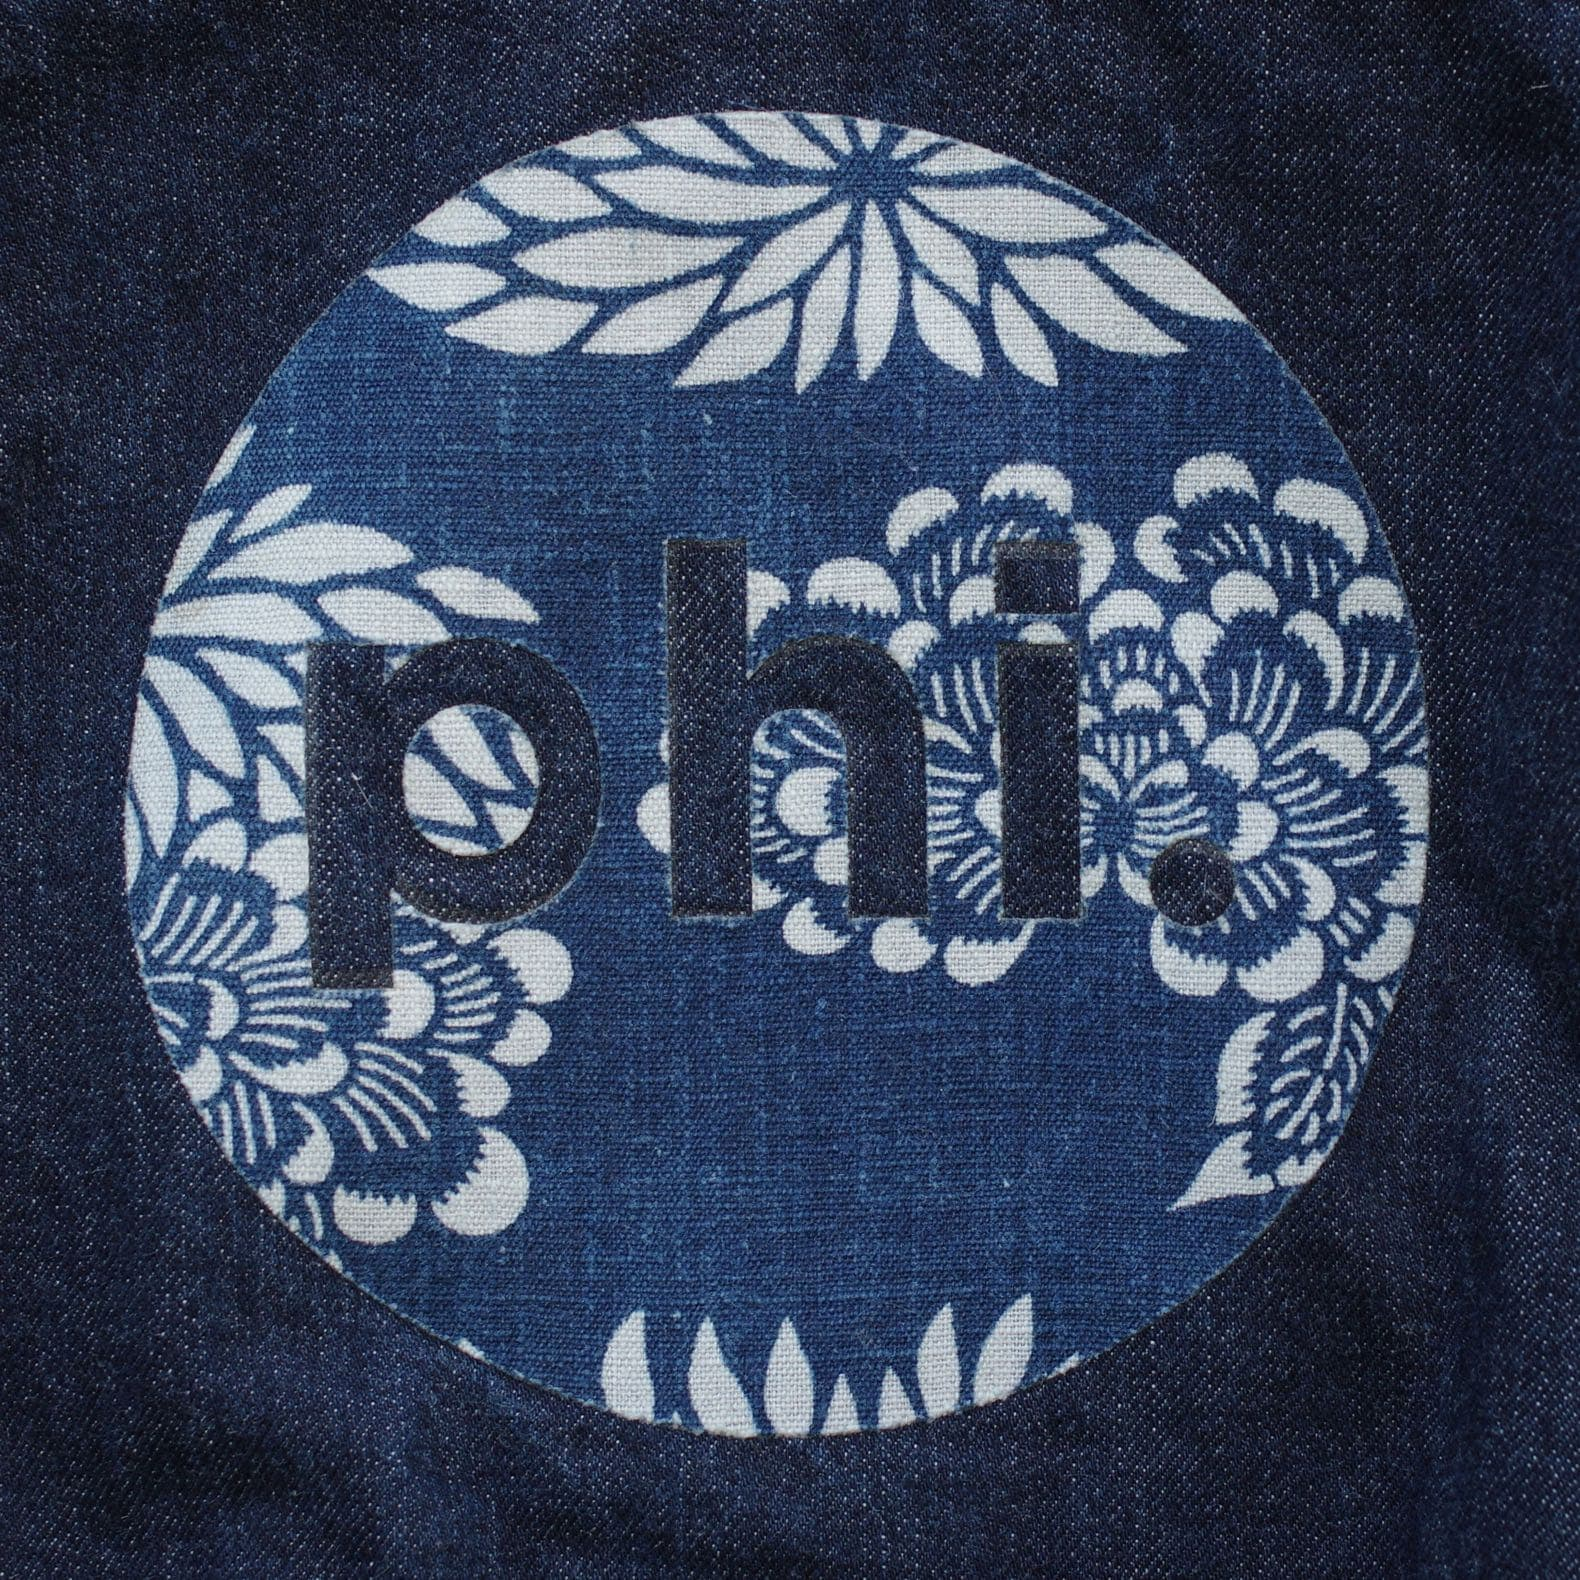 logo de la marque phi denim en kimono sur une toile de jean